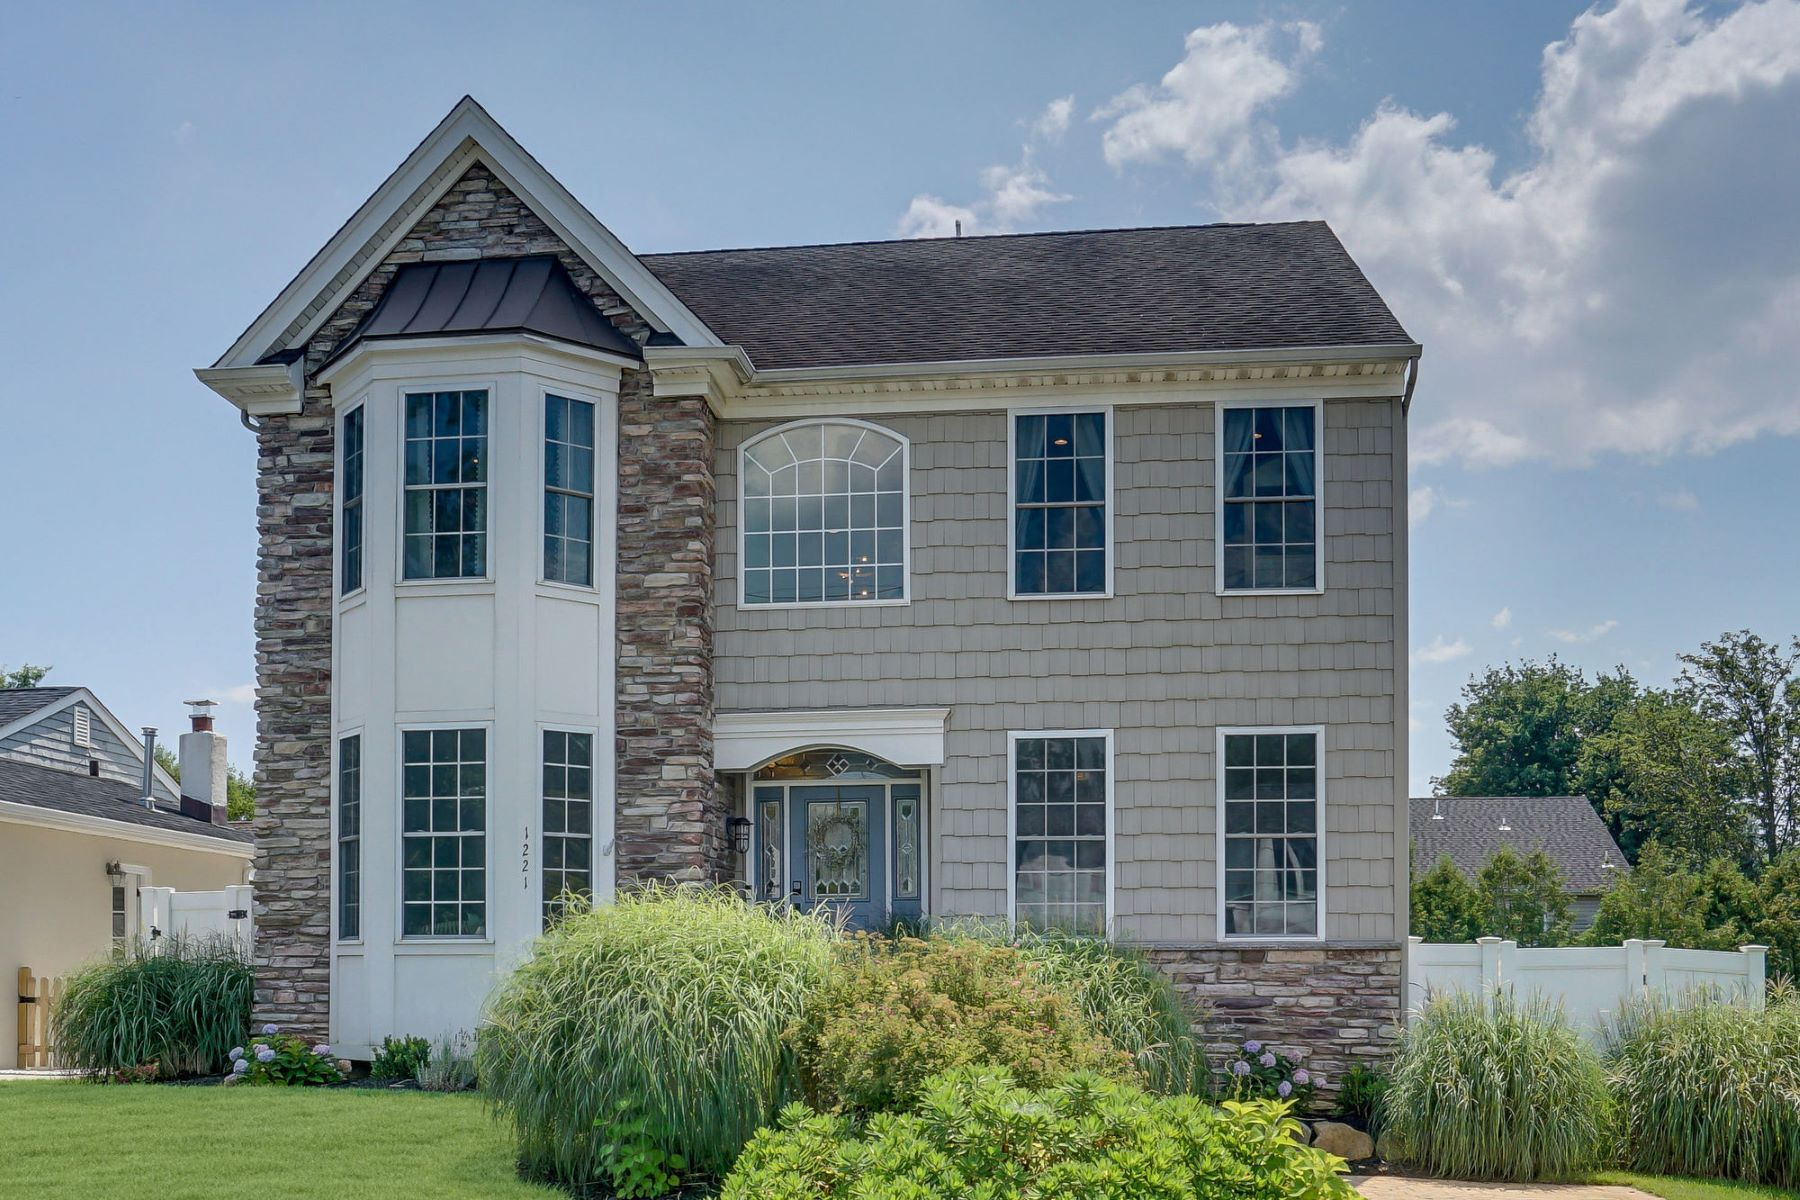 Single Family Homes für Verkauf beim Highly Desirable Manasquan Shores 1221 Narrumson Road, Wall, New Jersey 08736 Vereinigte Staaten